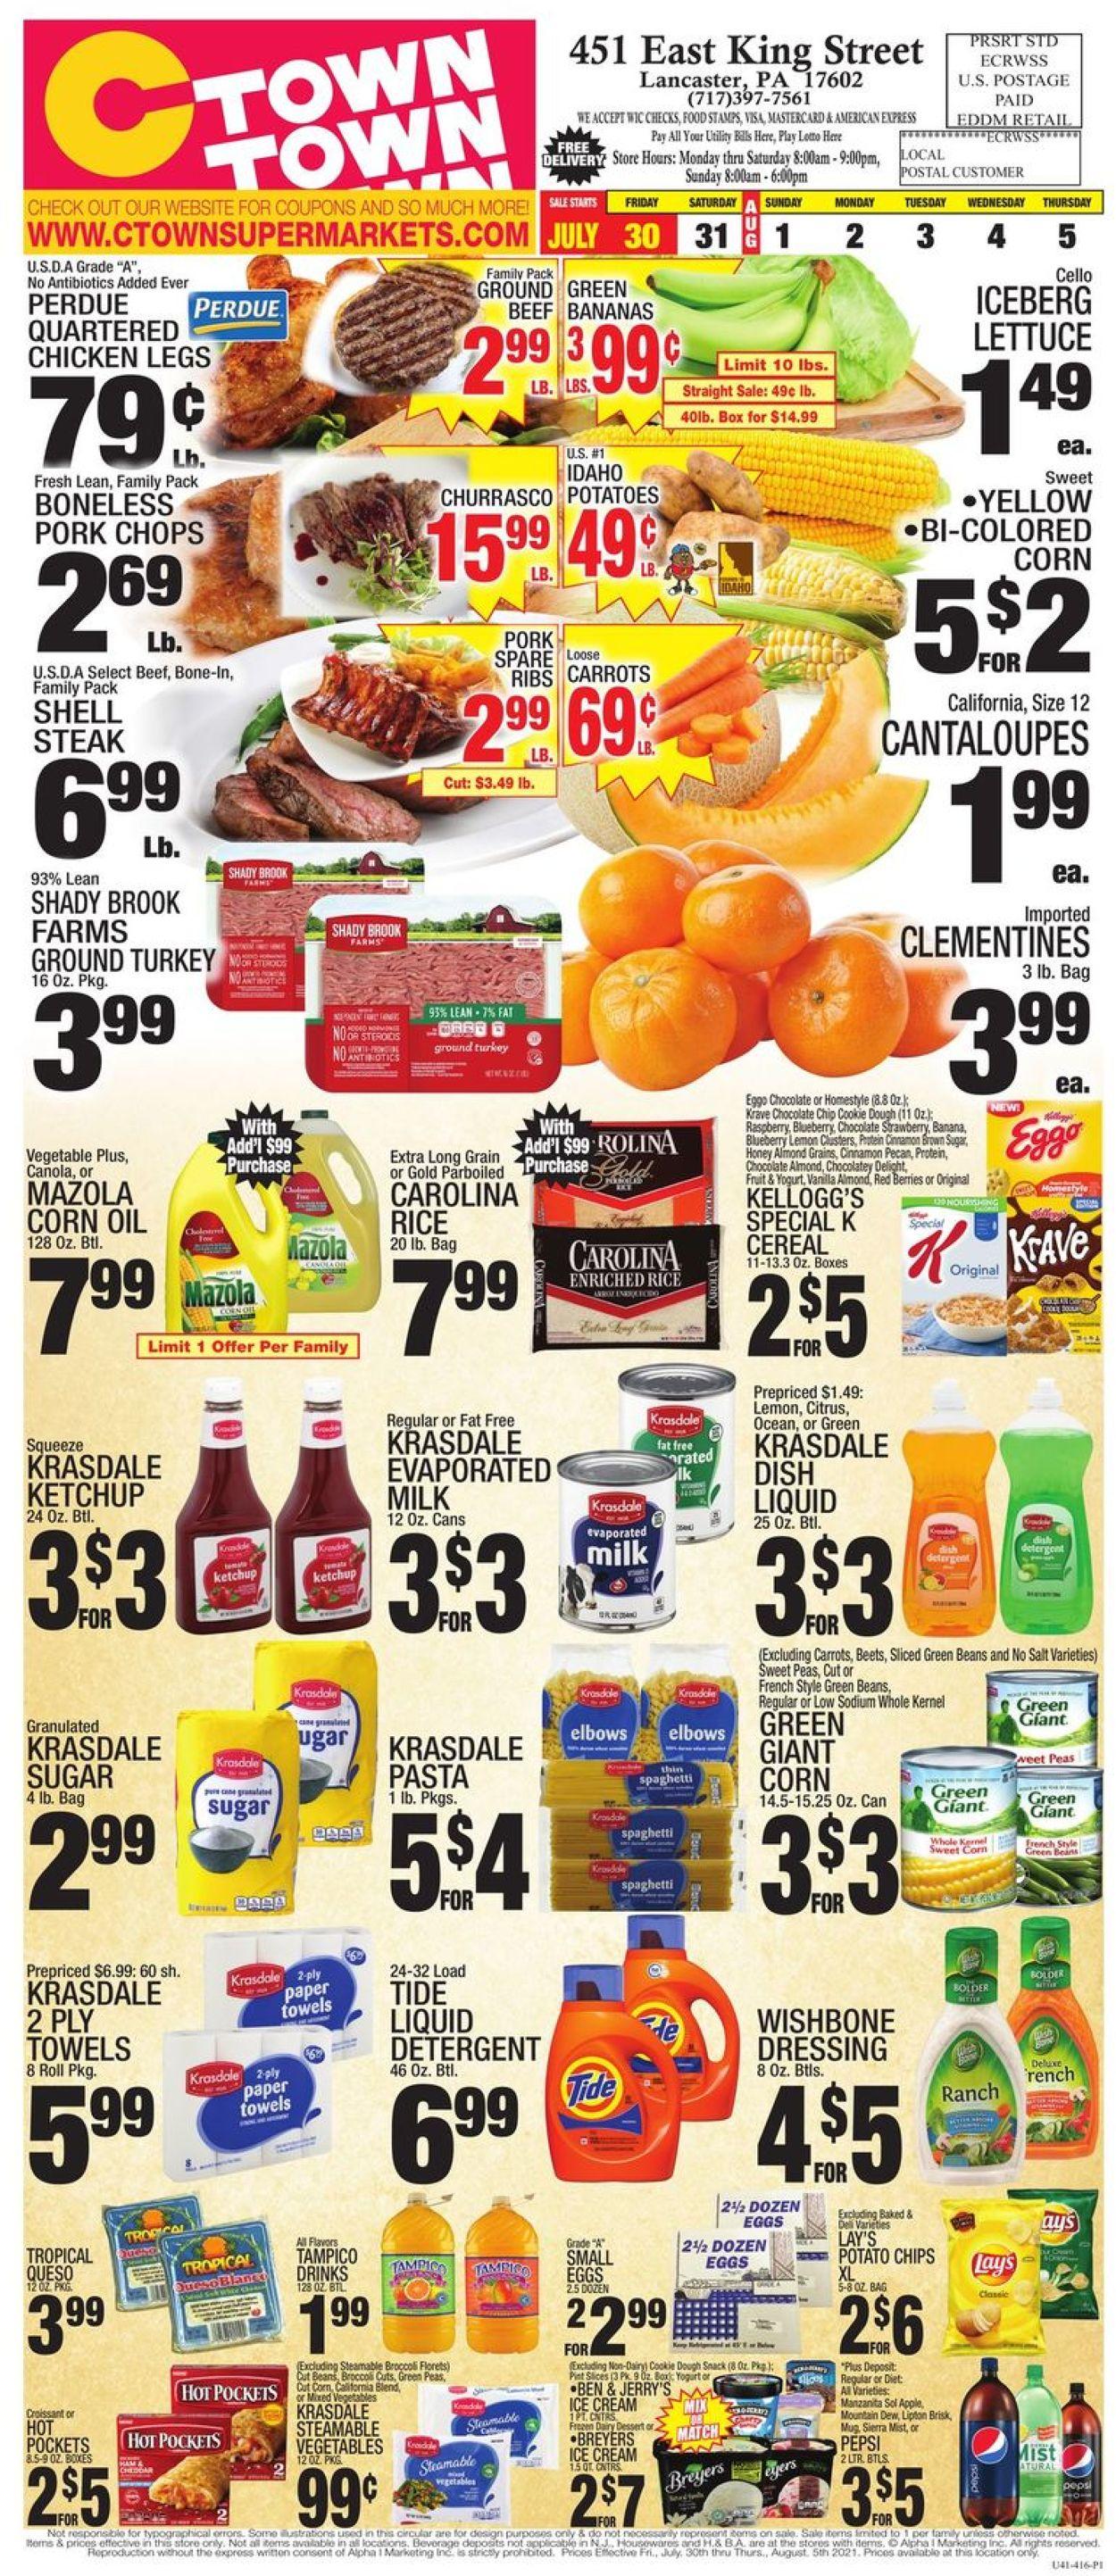 C-Town Weekly Ad Circular - valid 07/30-08/05/2021